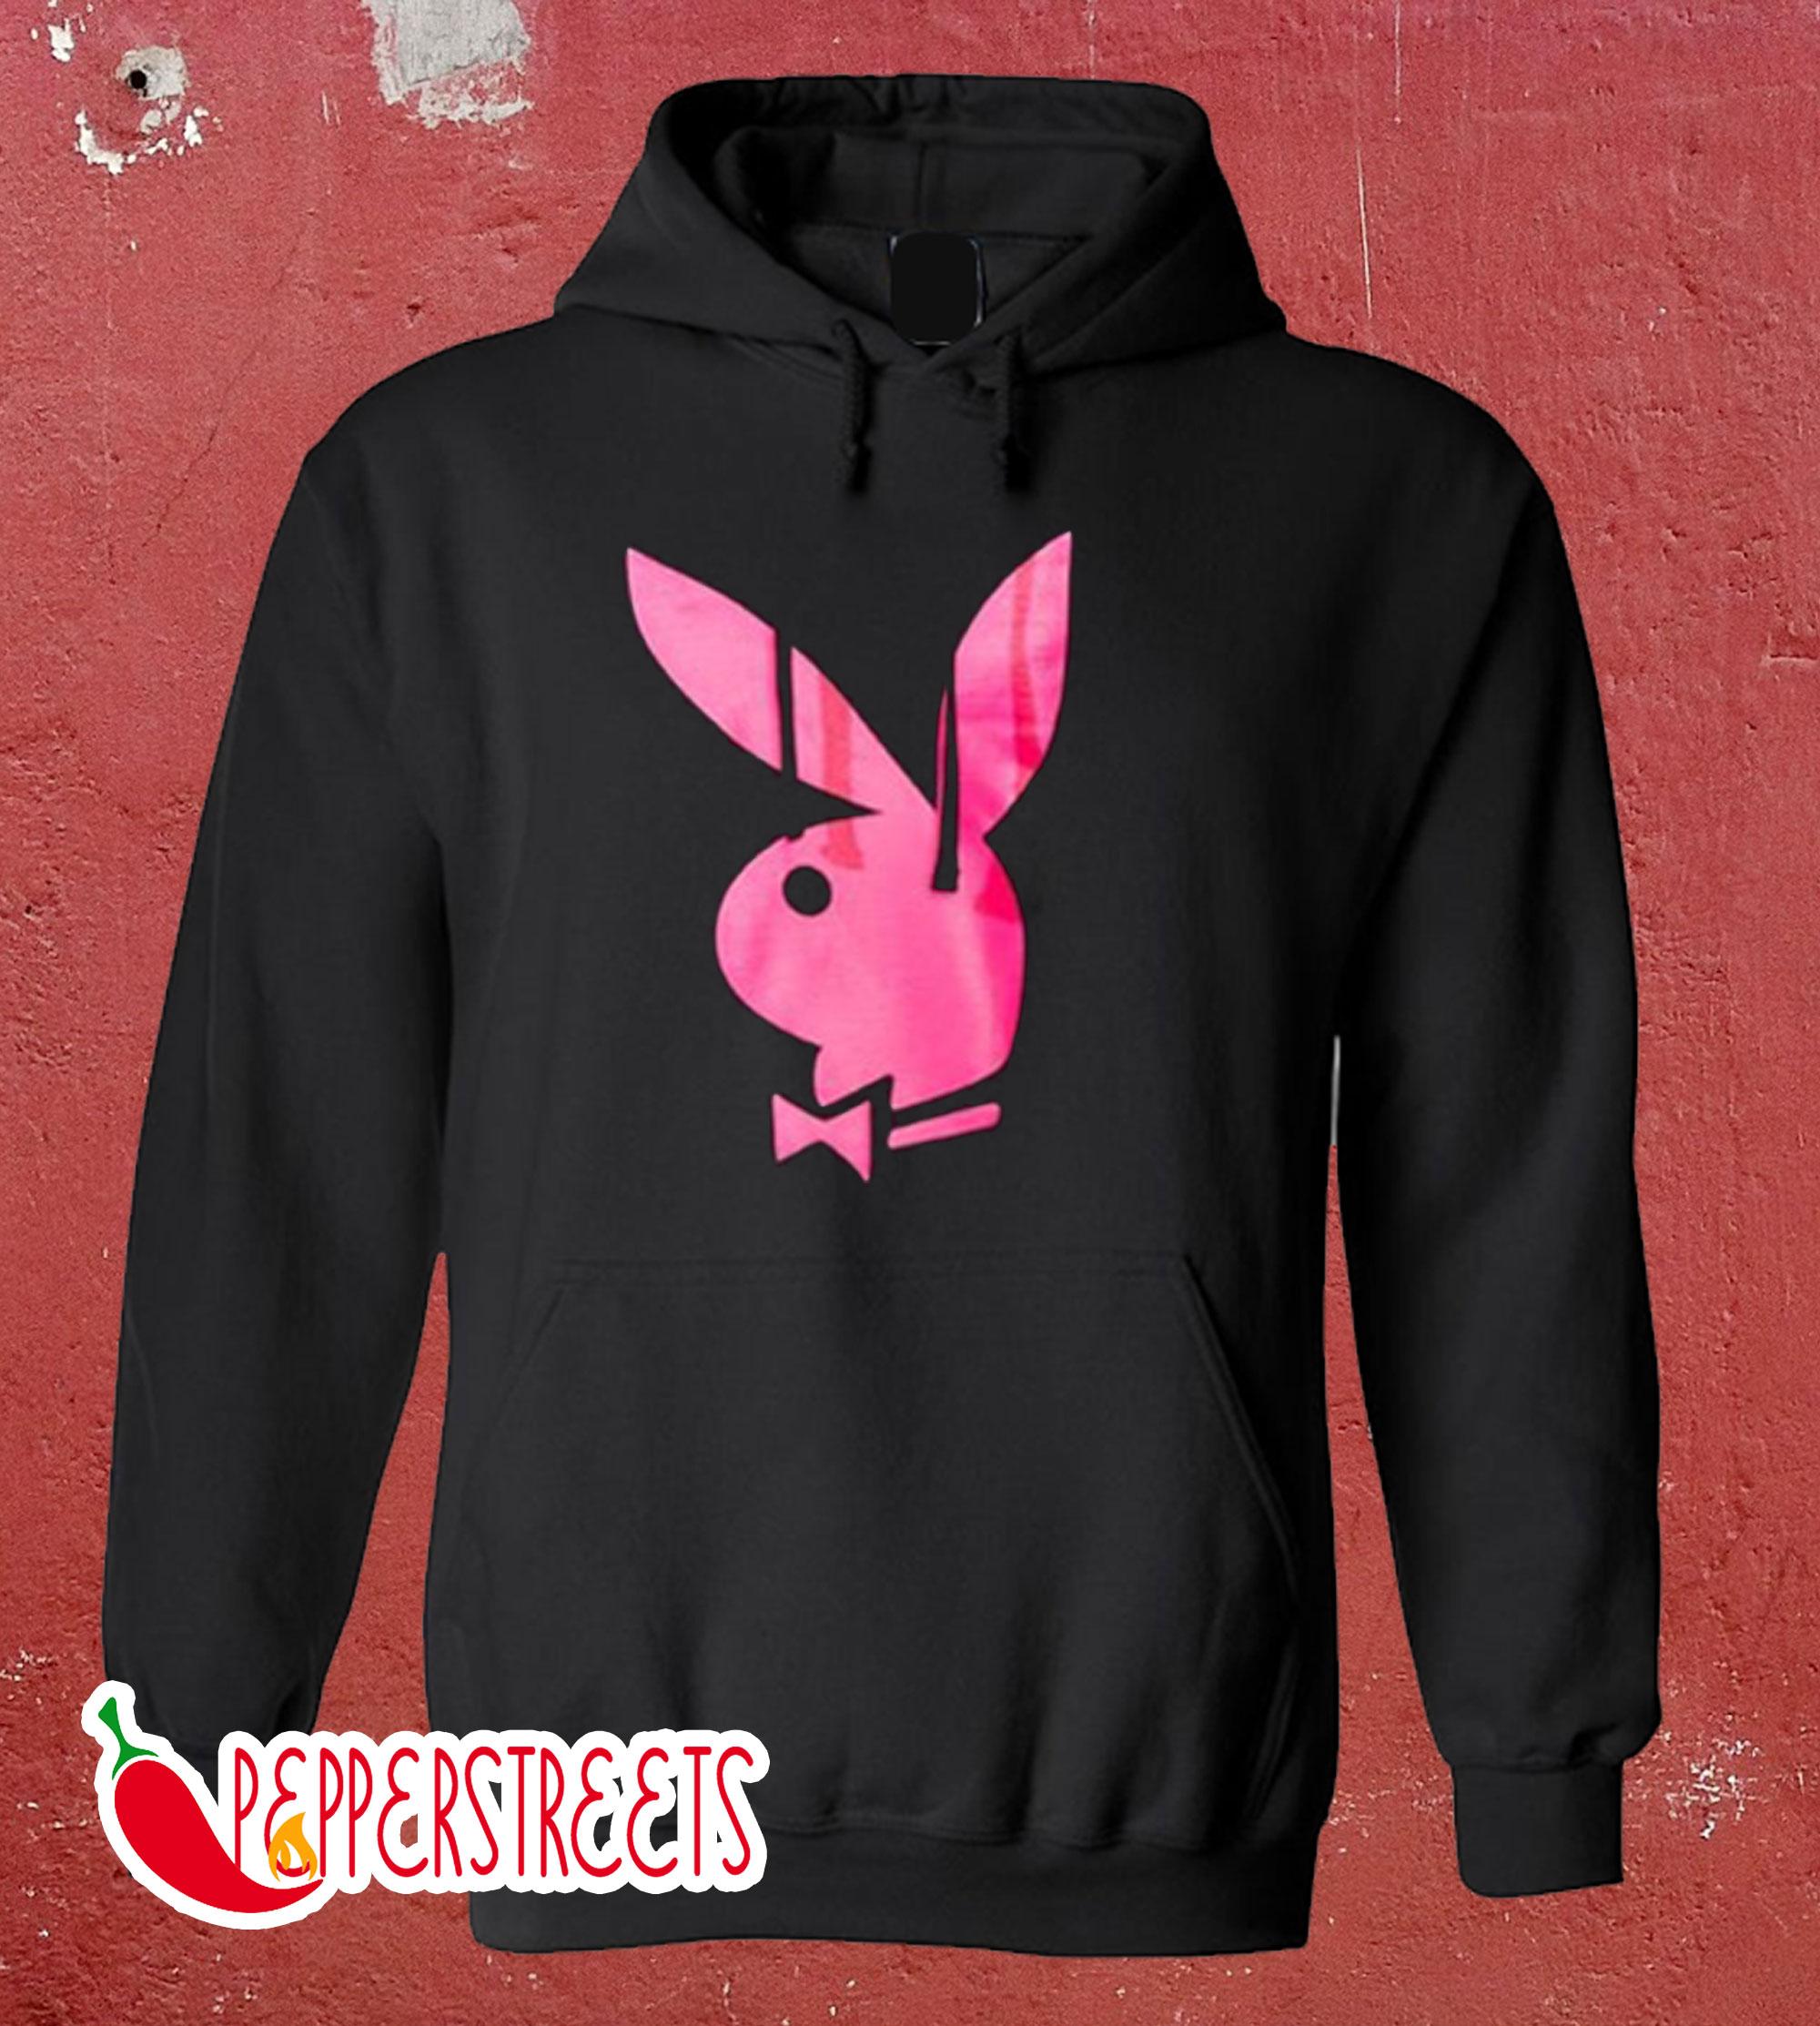 Anti Social Social Club Playboy Hoodie (2)